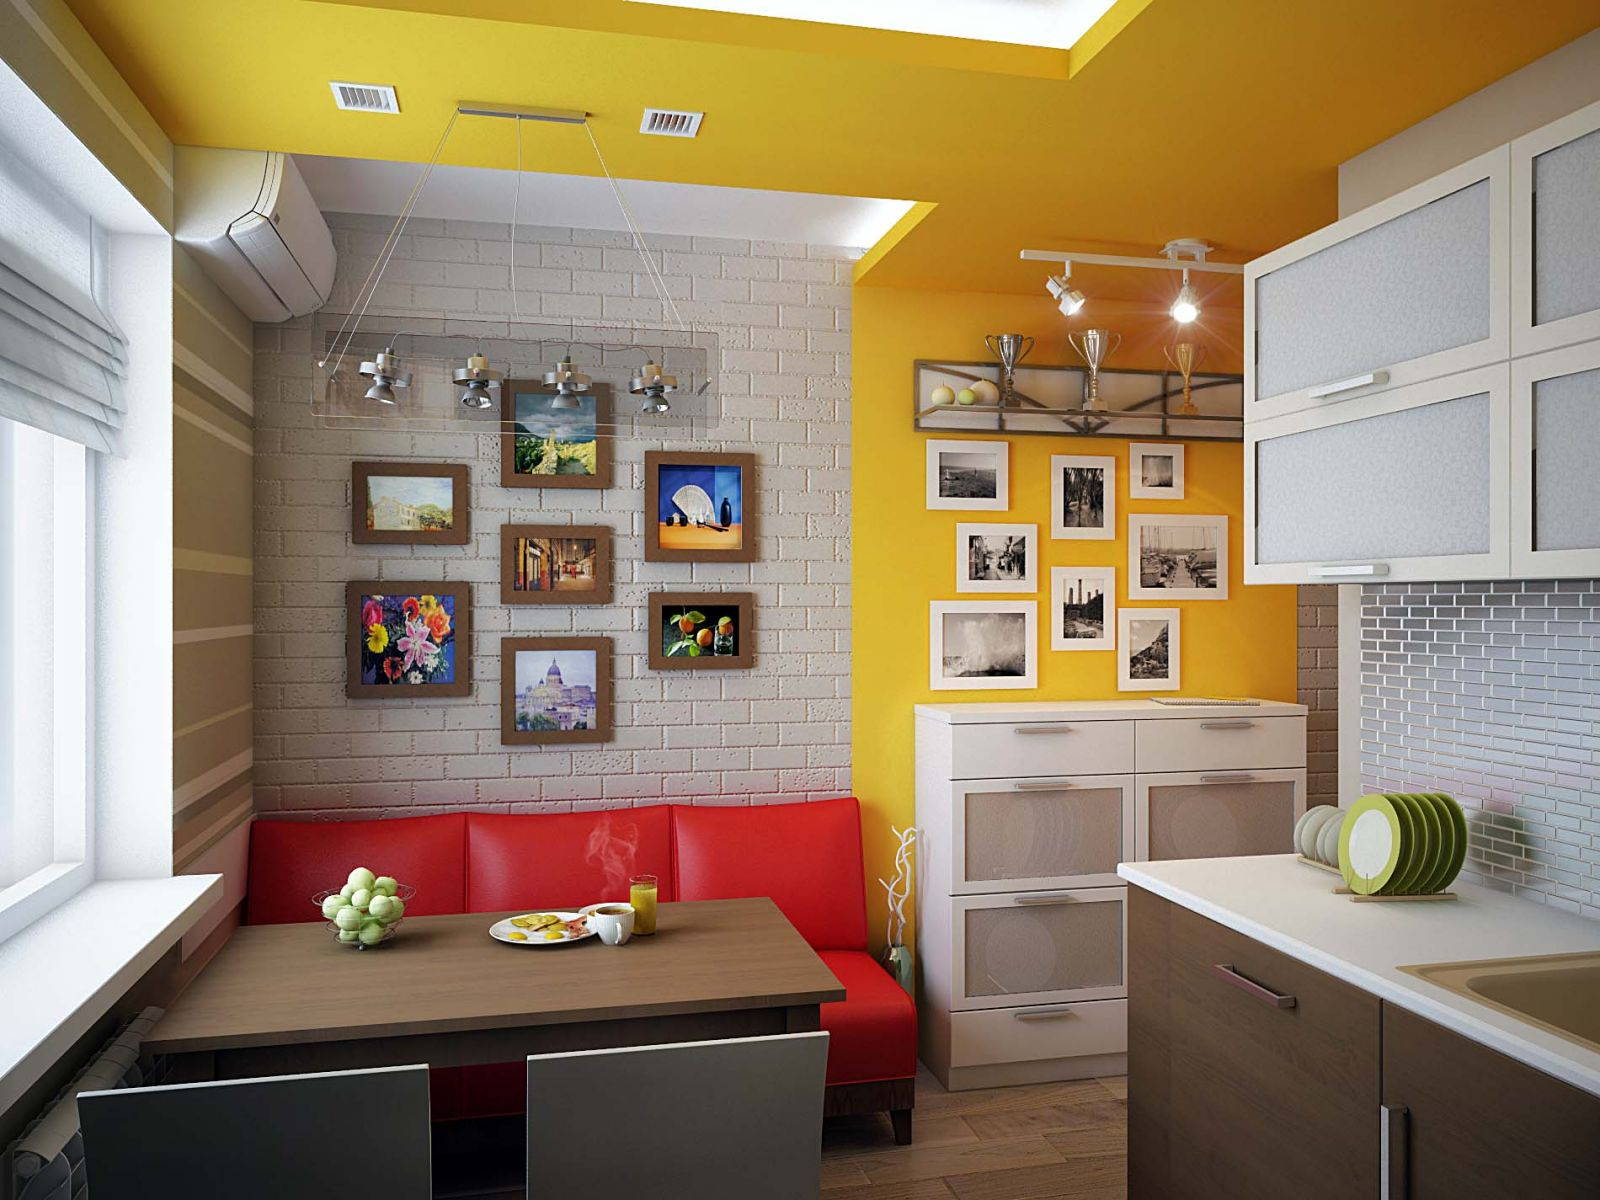 кухня 10 кв м с диваном фото